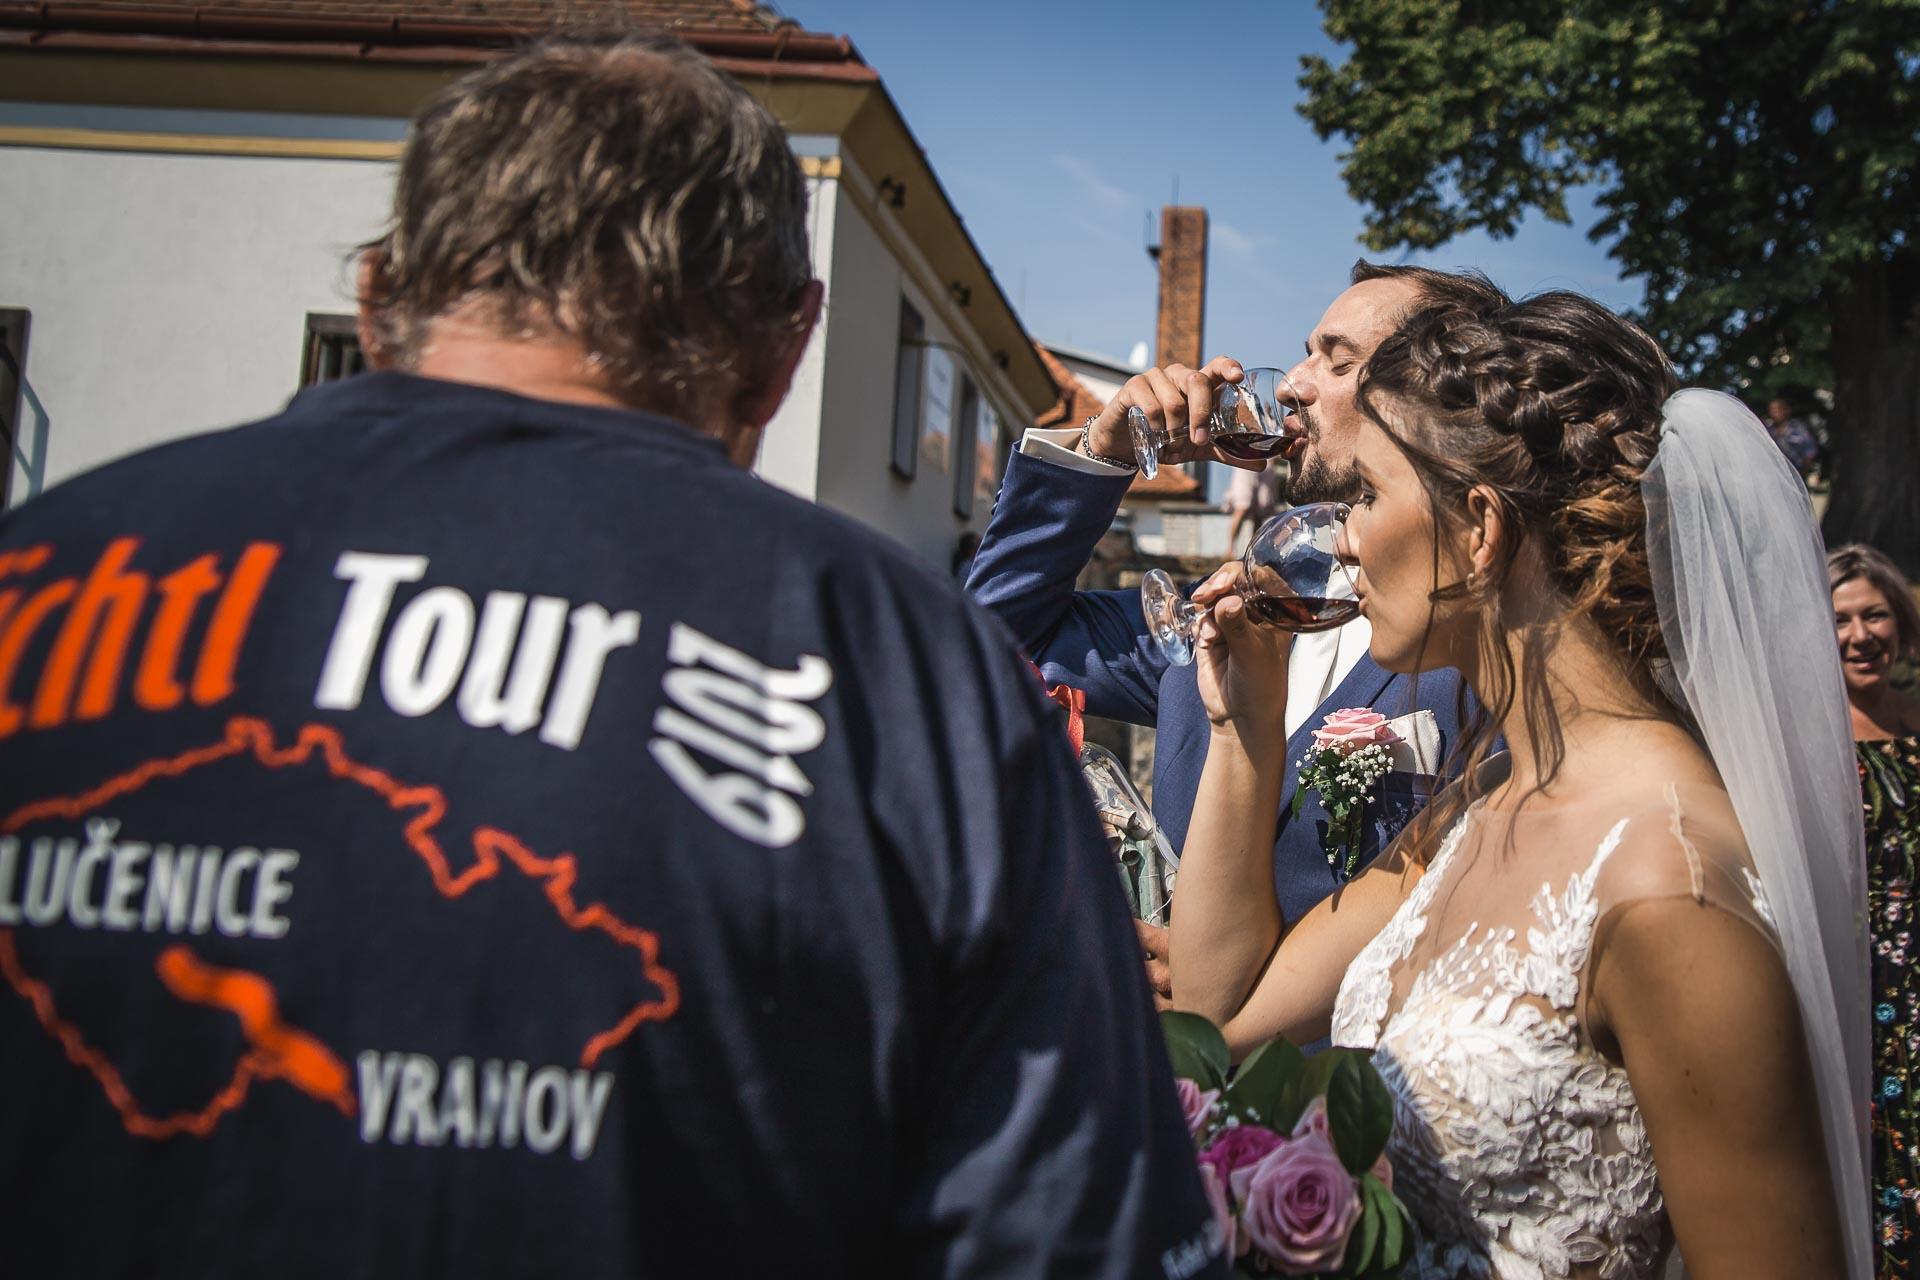 svatební-fotograf-wedding-svatebni-video-orlík-vltava-kostel-statek-stodola-boho-svatba-Beautyfoto-306